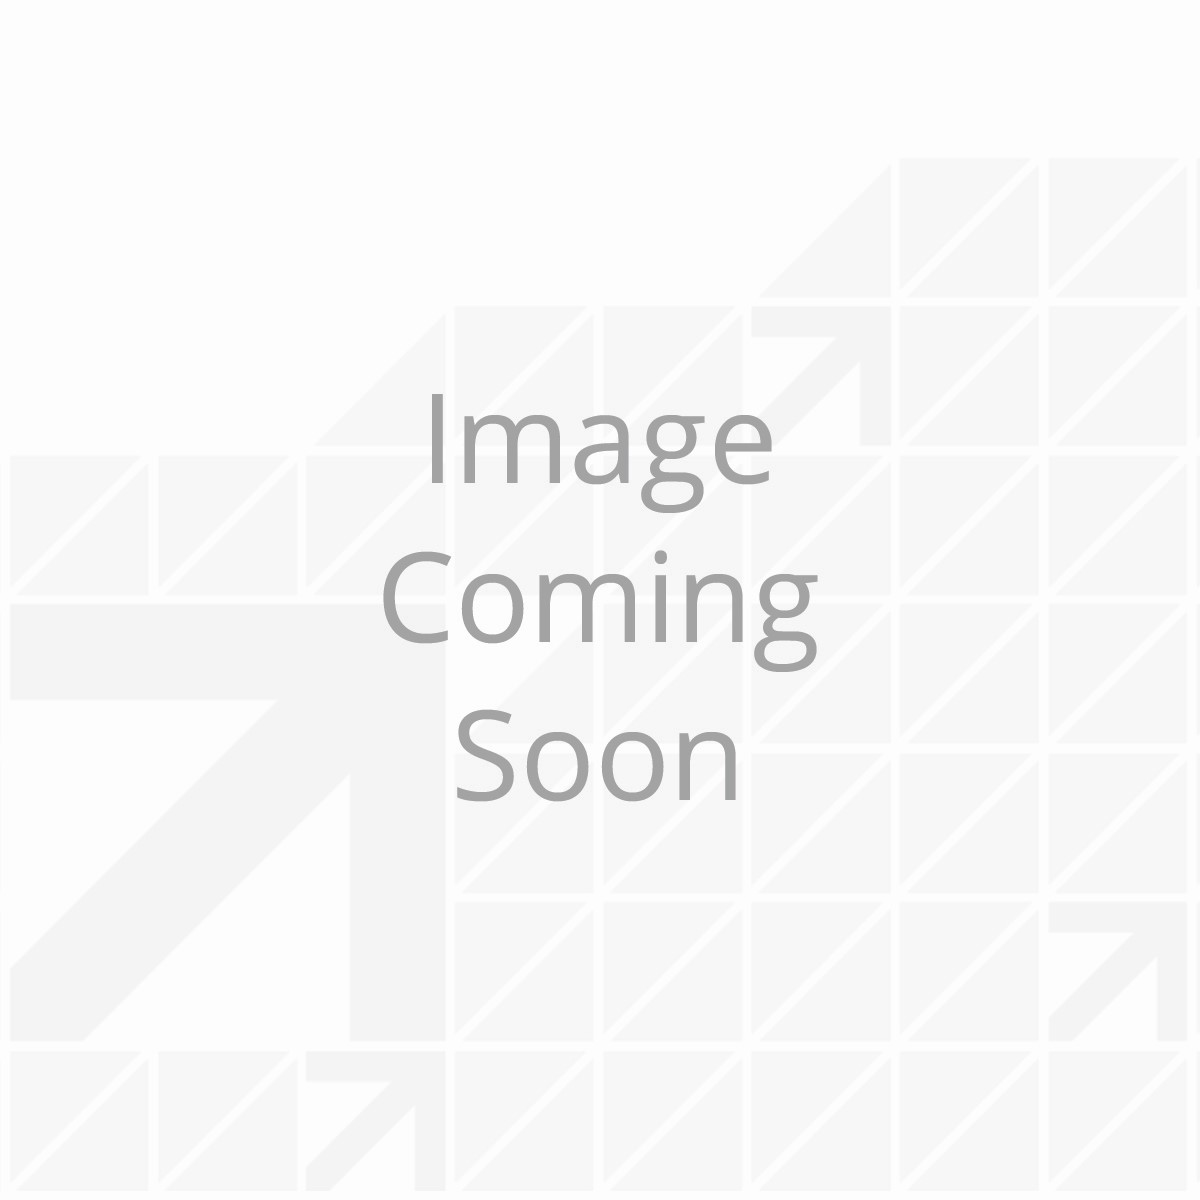 Cross Fitting (6850-04-04-04-04)